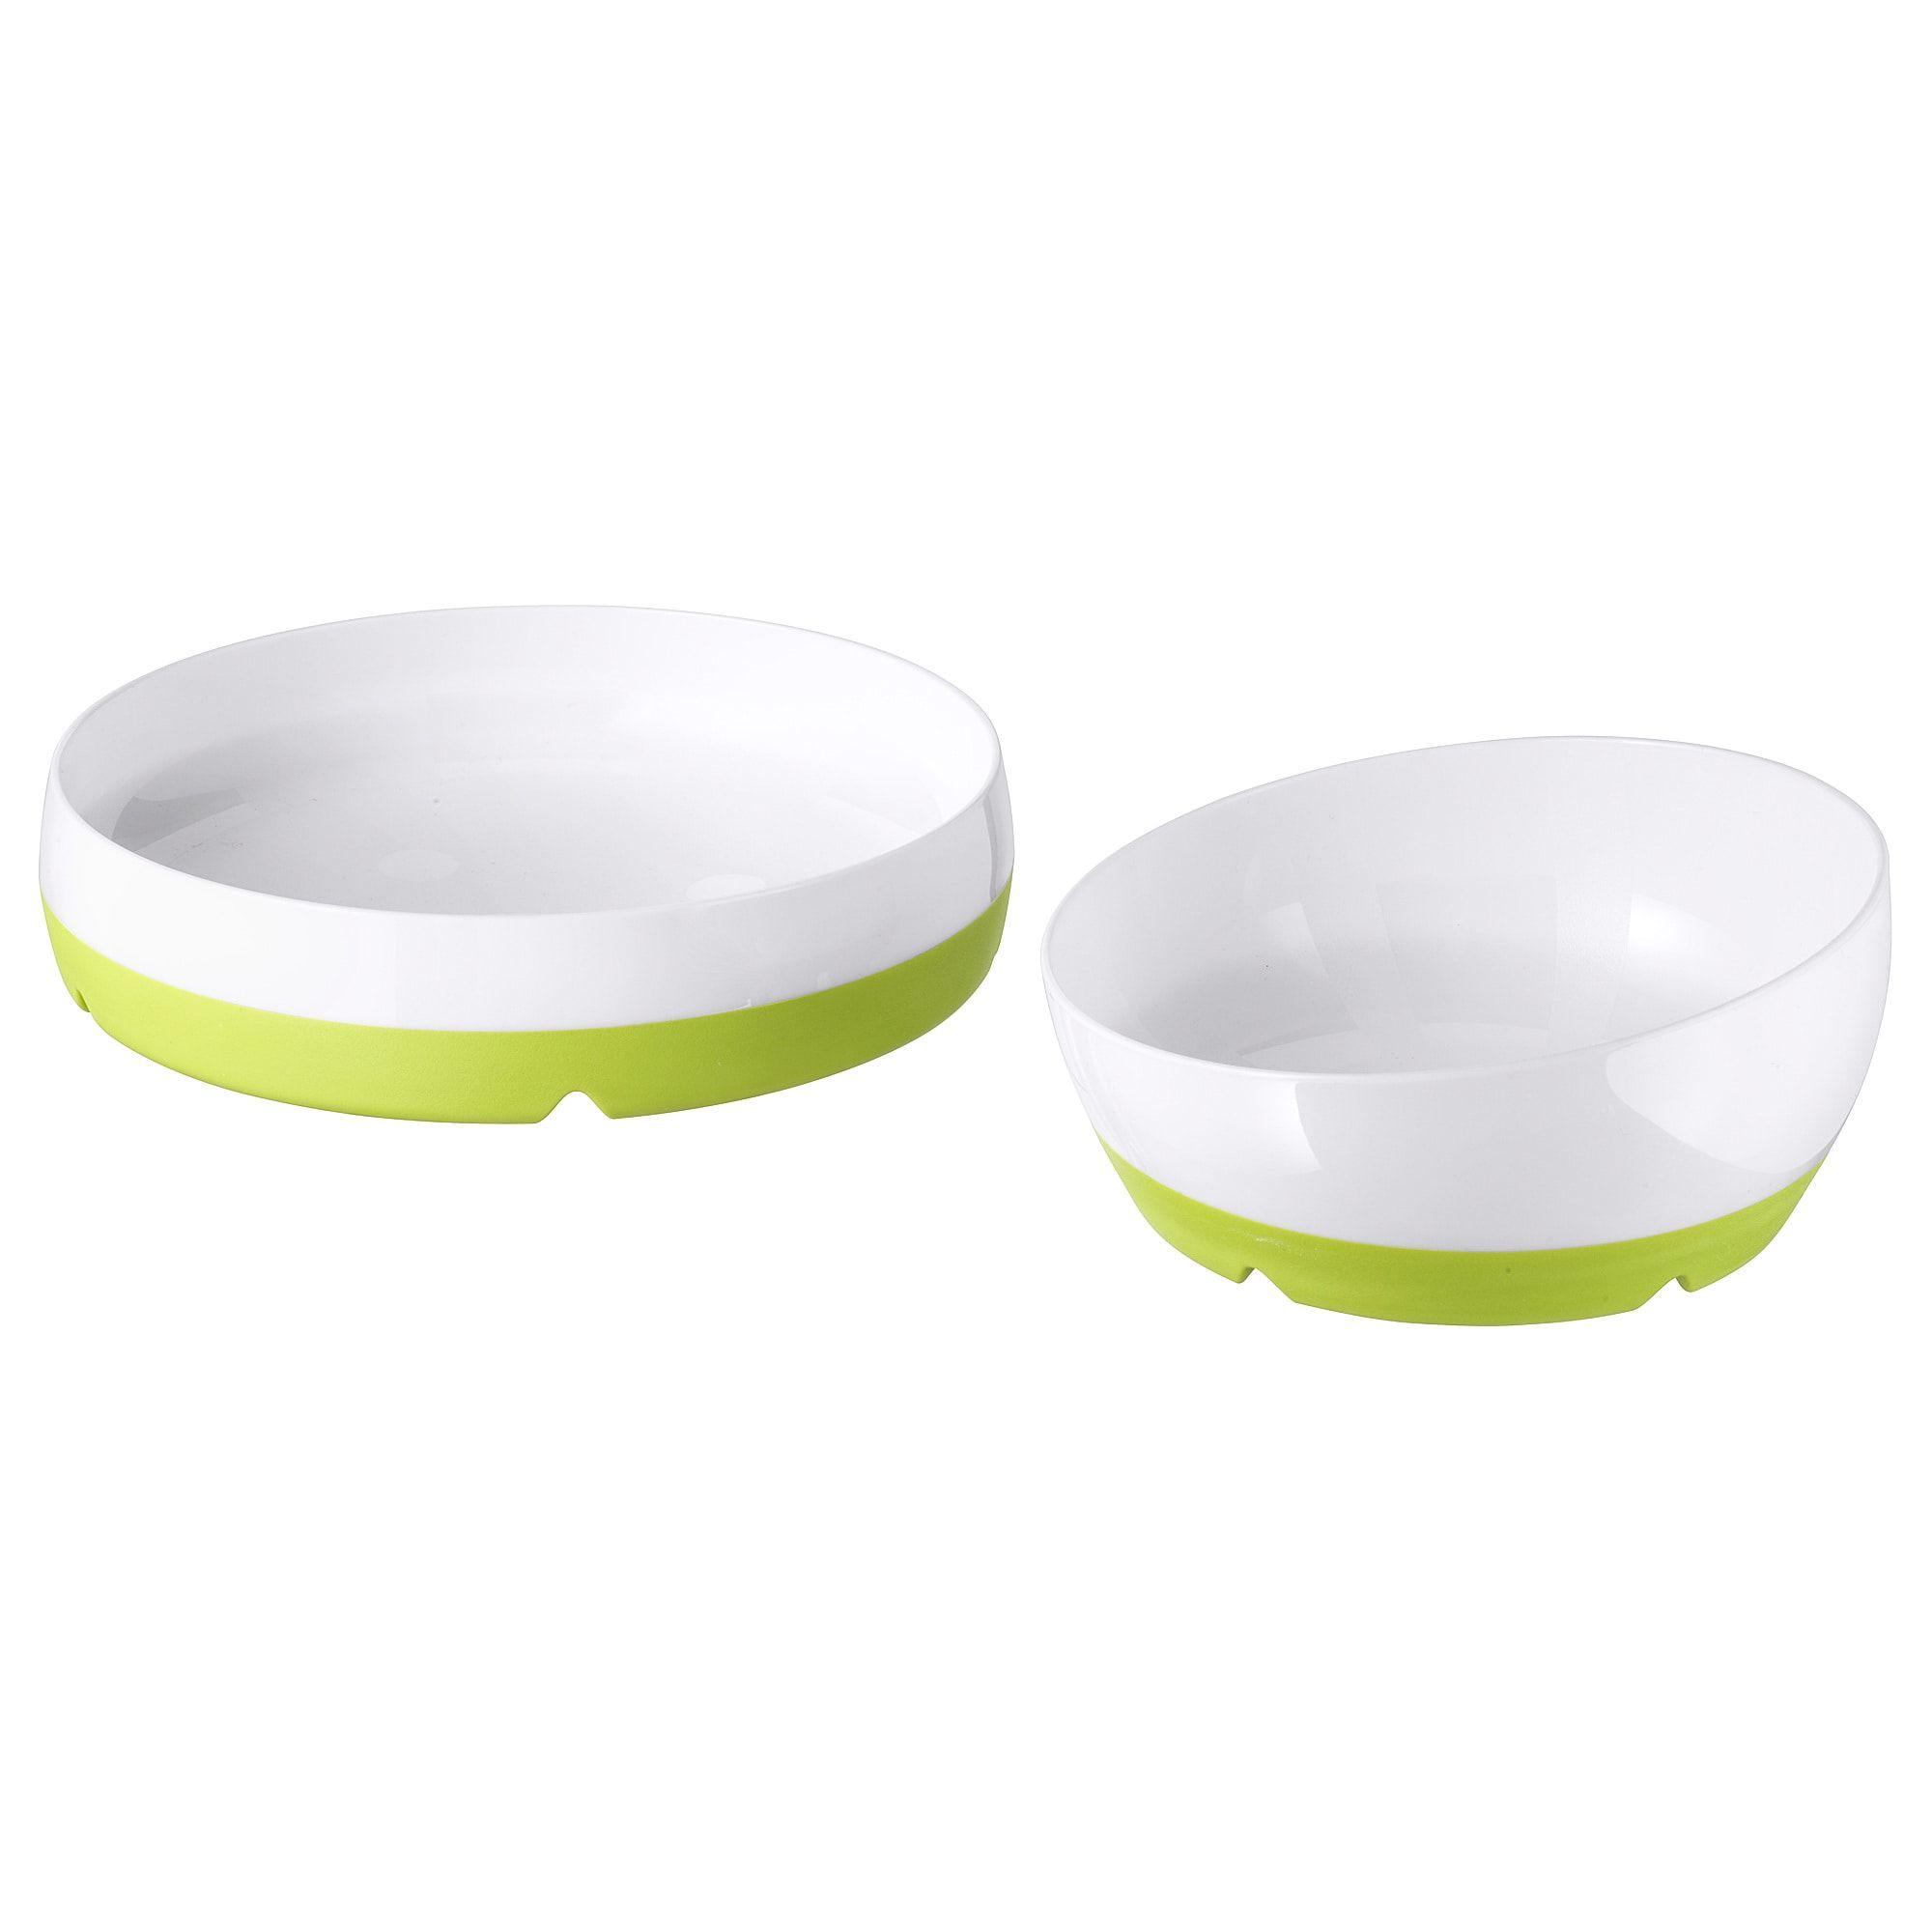 Smagli Plate Bowl Plates Bowls Plates Ikea